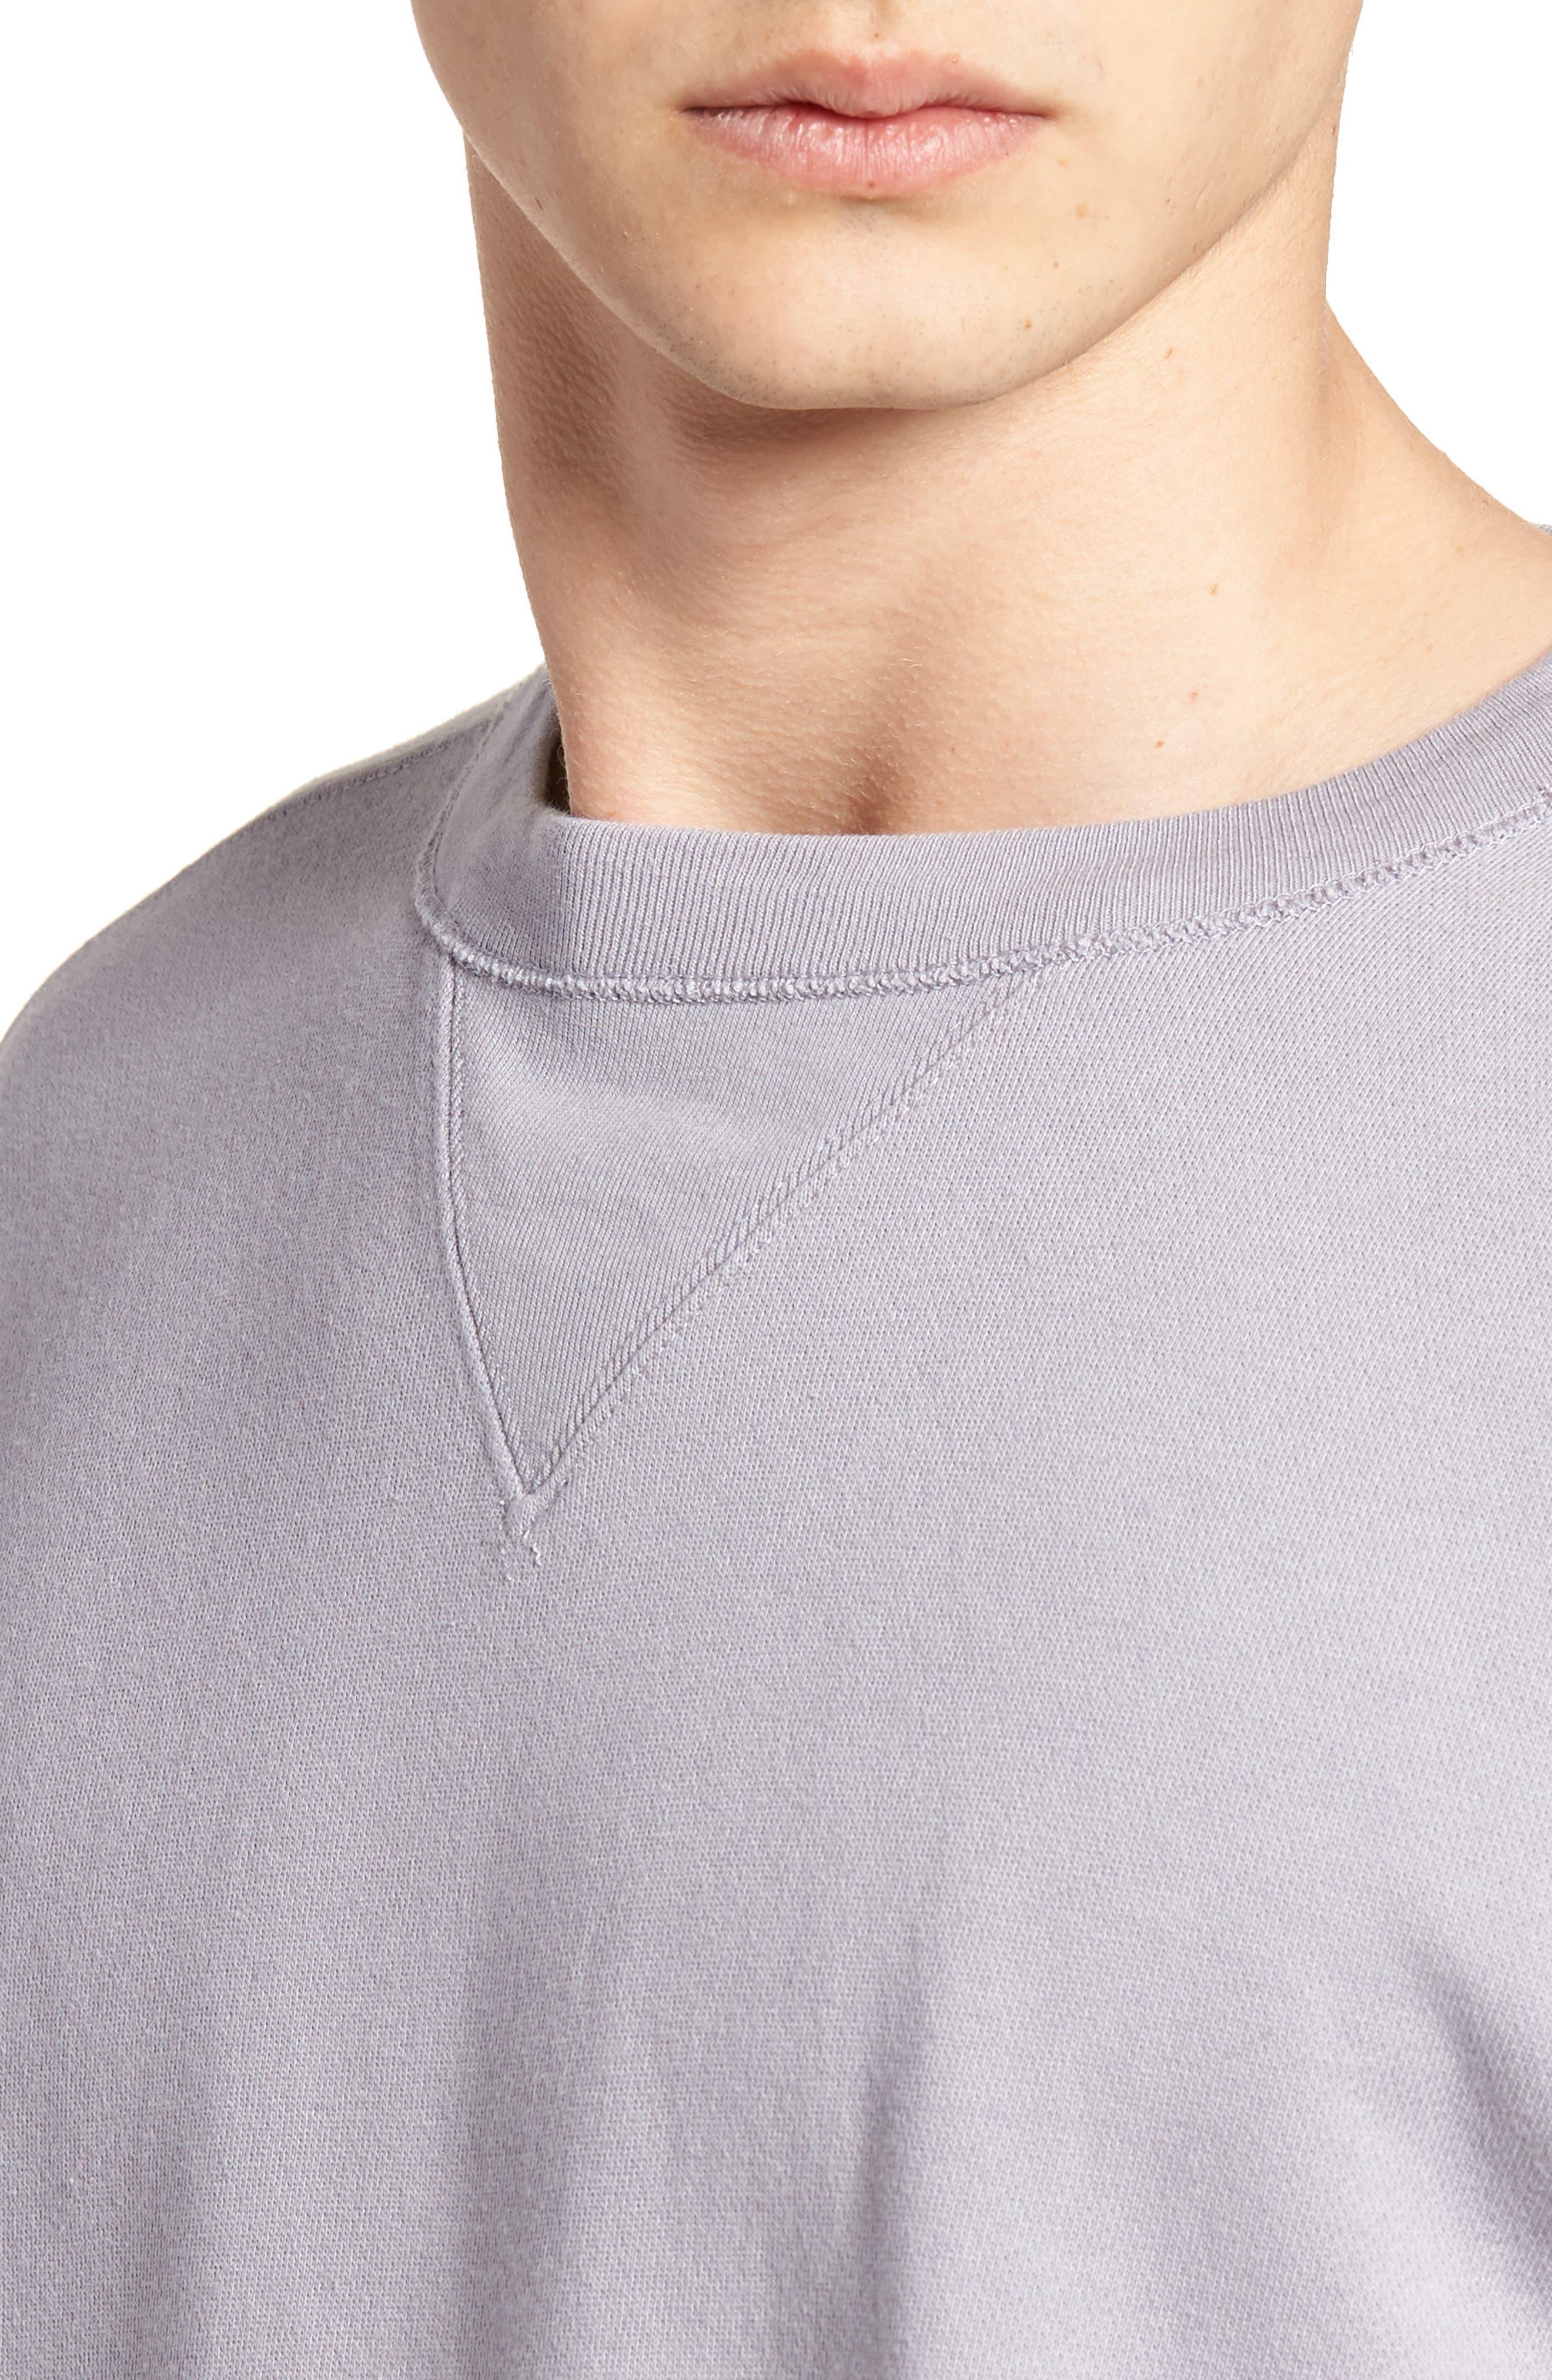 Bay Meadows Sweatshirt,                             Alternate thumbnail 4, color,